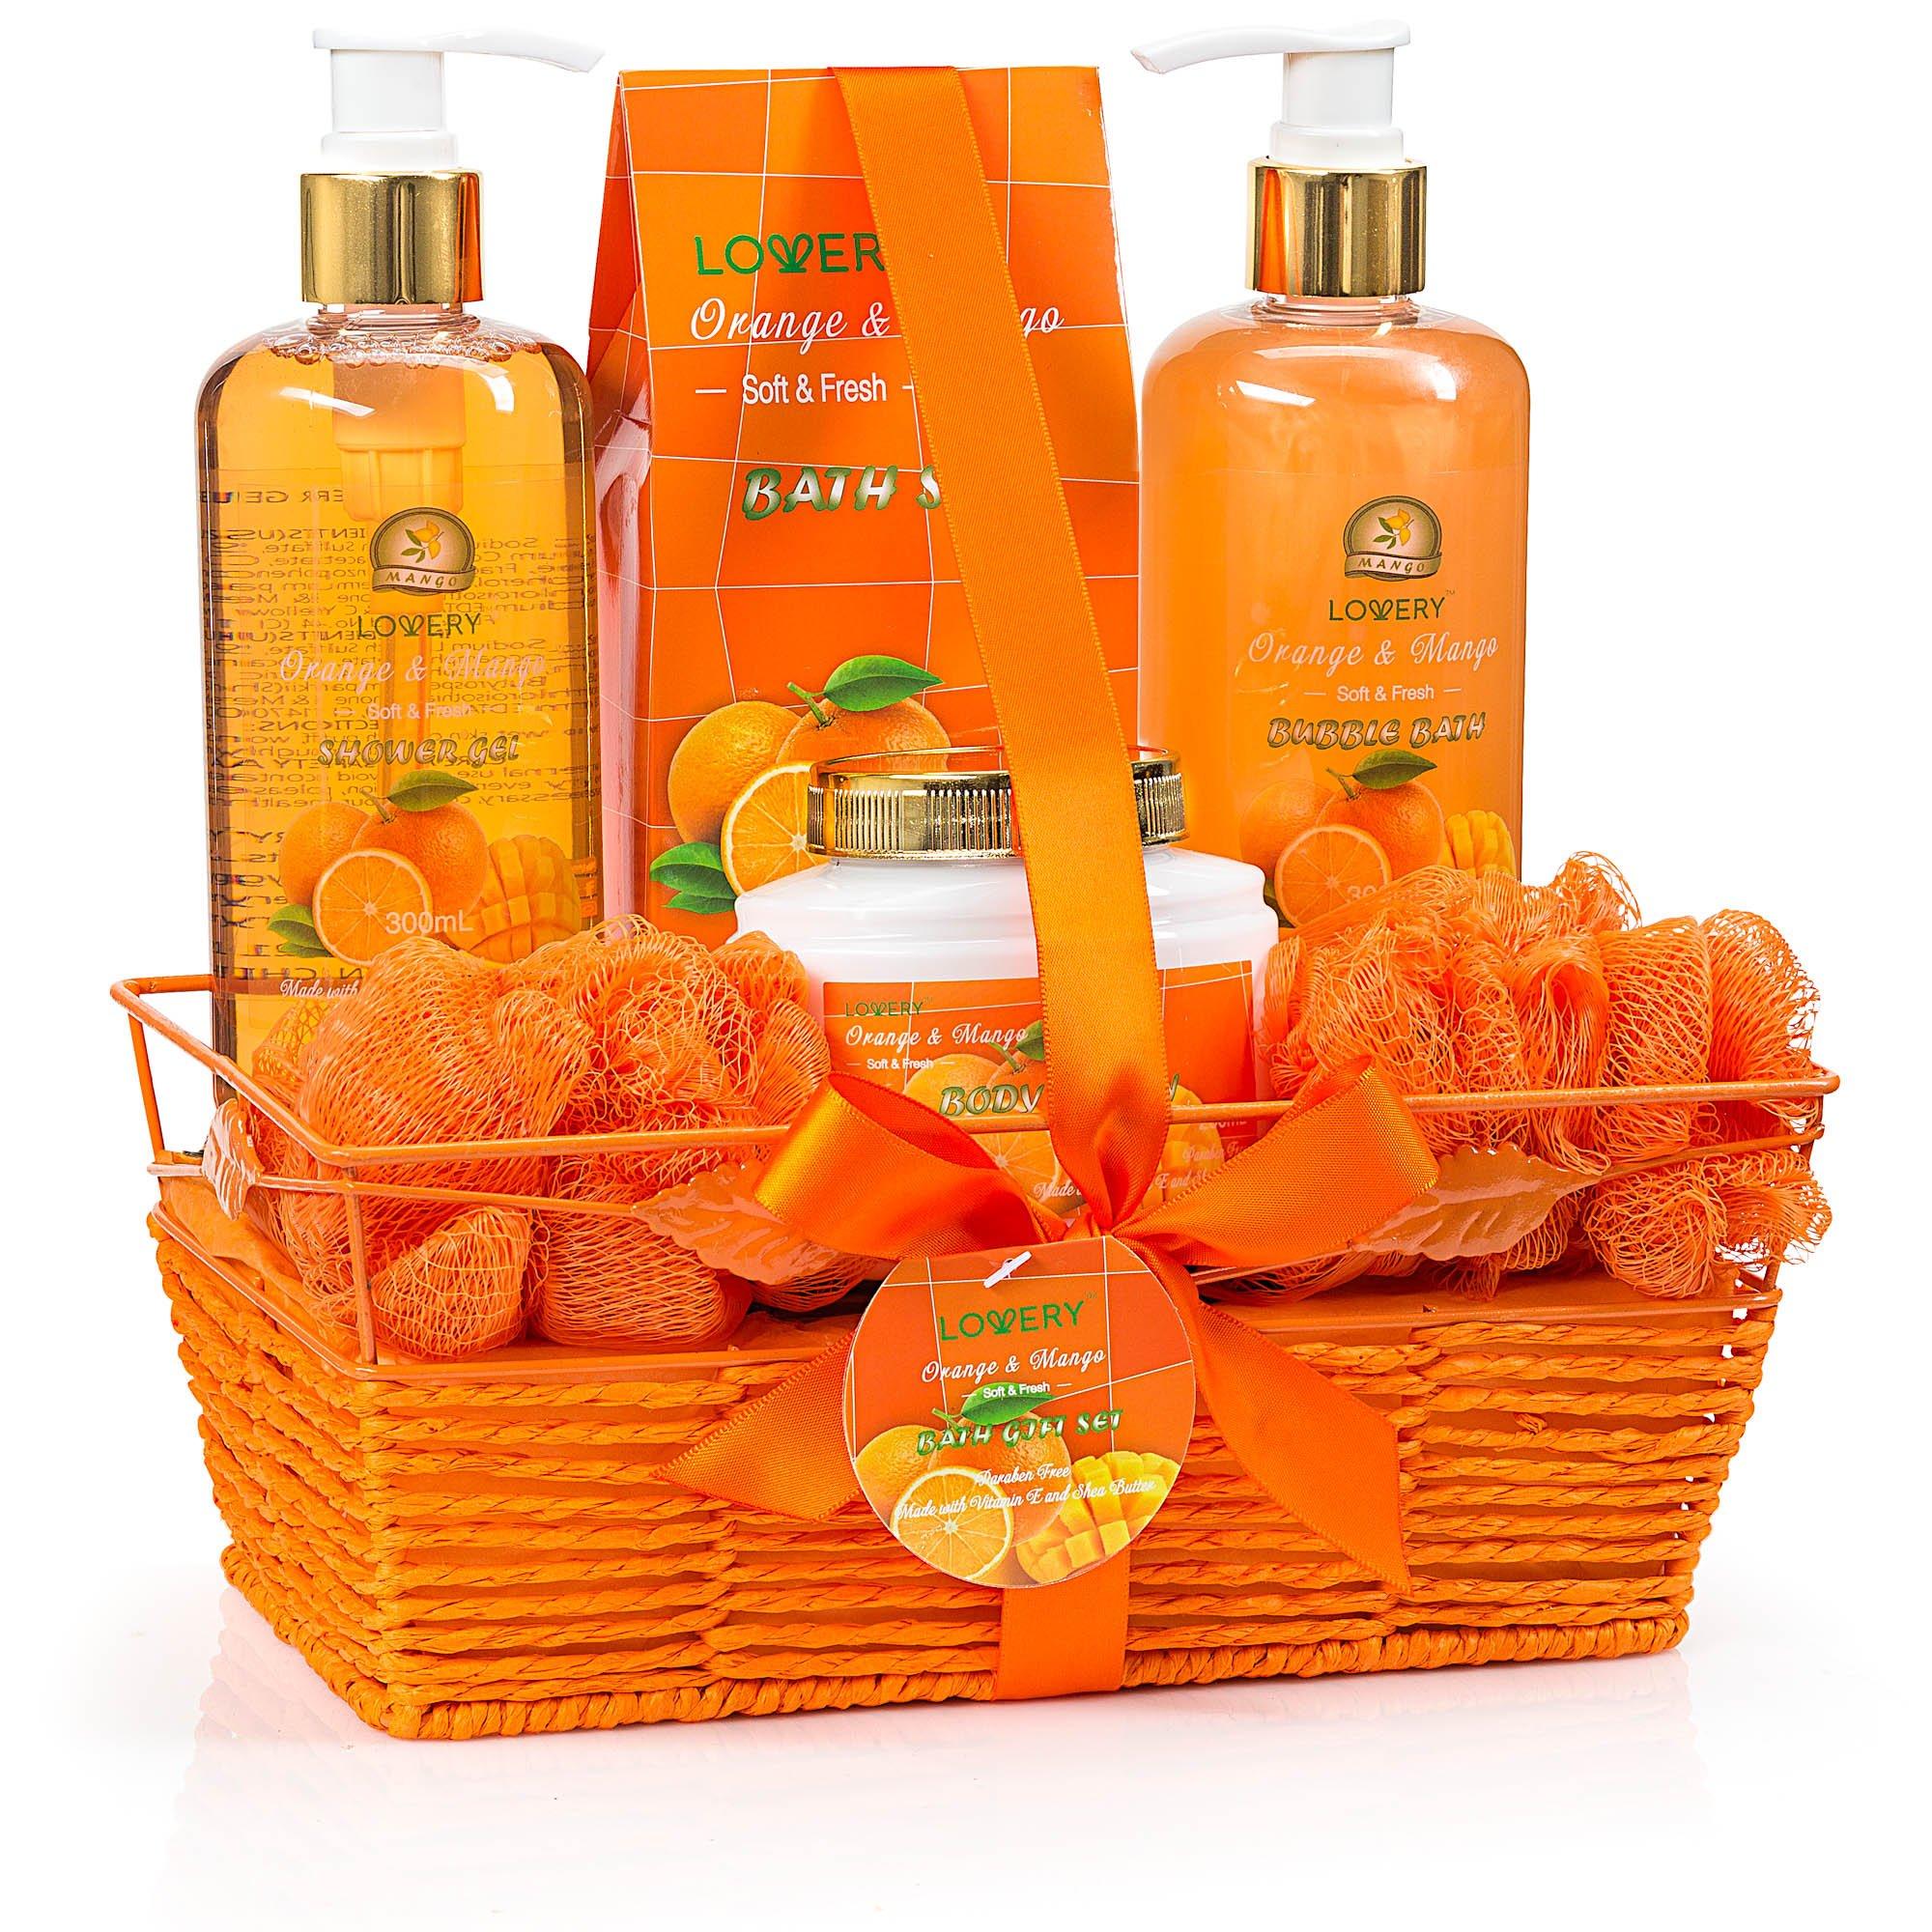 Easter Spa Gift Basket for Women - Orange & Mango Fragrance - Luxury 7 Piece Bath & Body Set For Women & Men, Contains Shower Gel, Bubble Bath, Body Lotion, Salts, 2 Bath Poufs and Handmade Basket